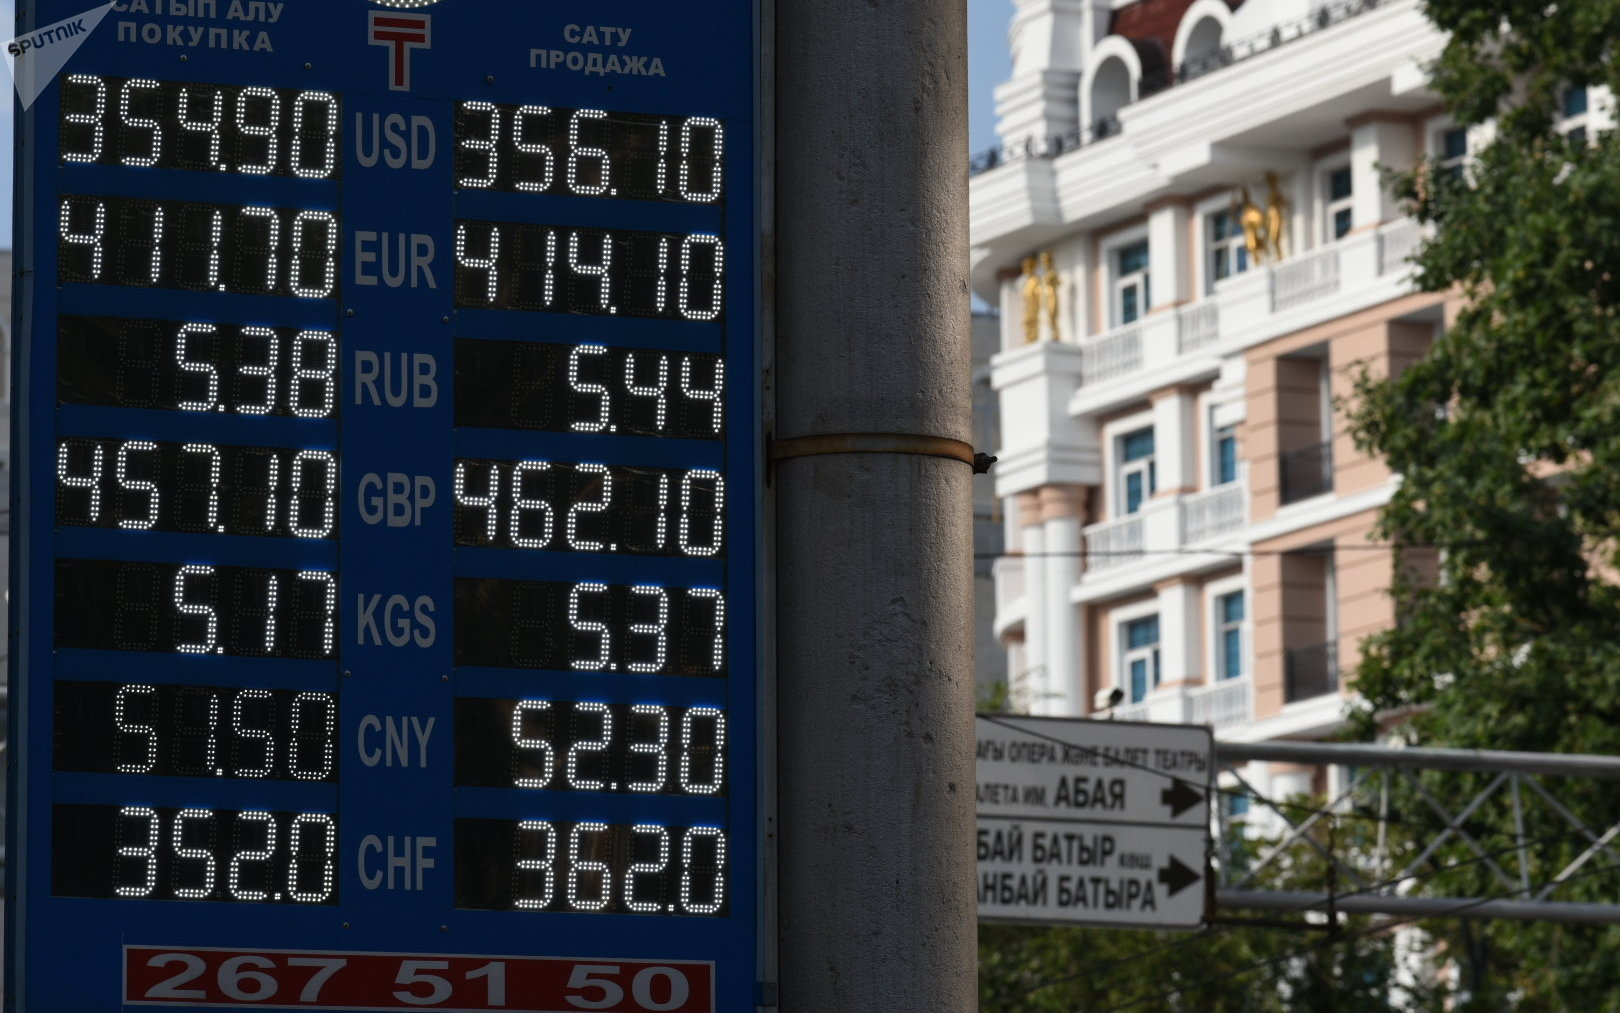 Курс валют в обменниках на 9 августа